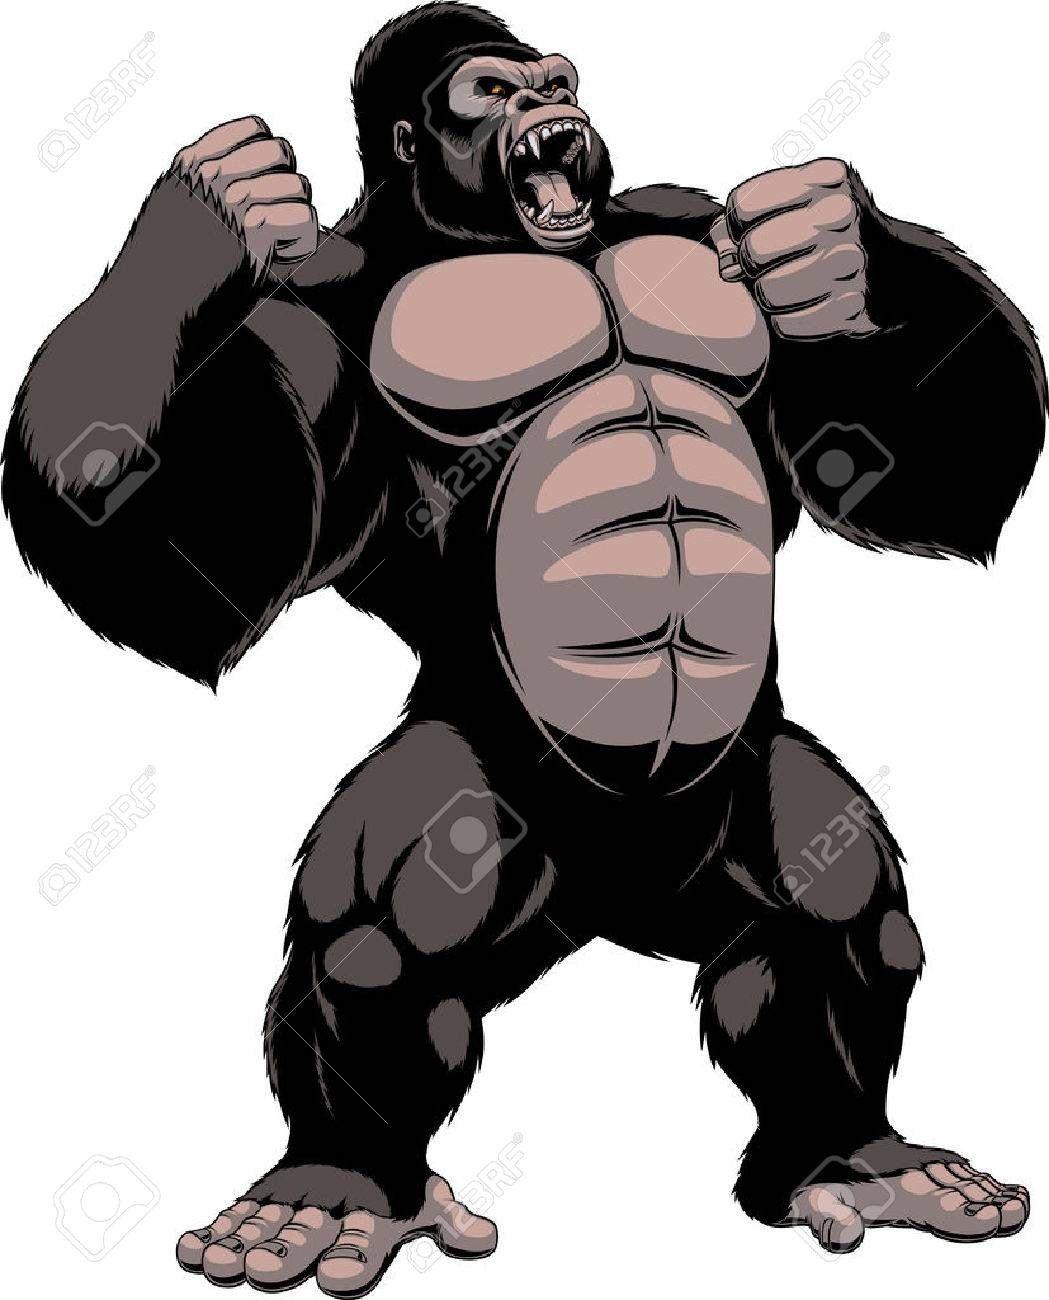 clipart Ape clipart king kong. Tattoo ideas creature drawings